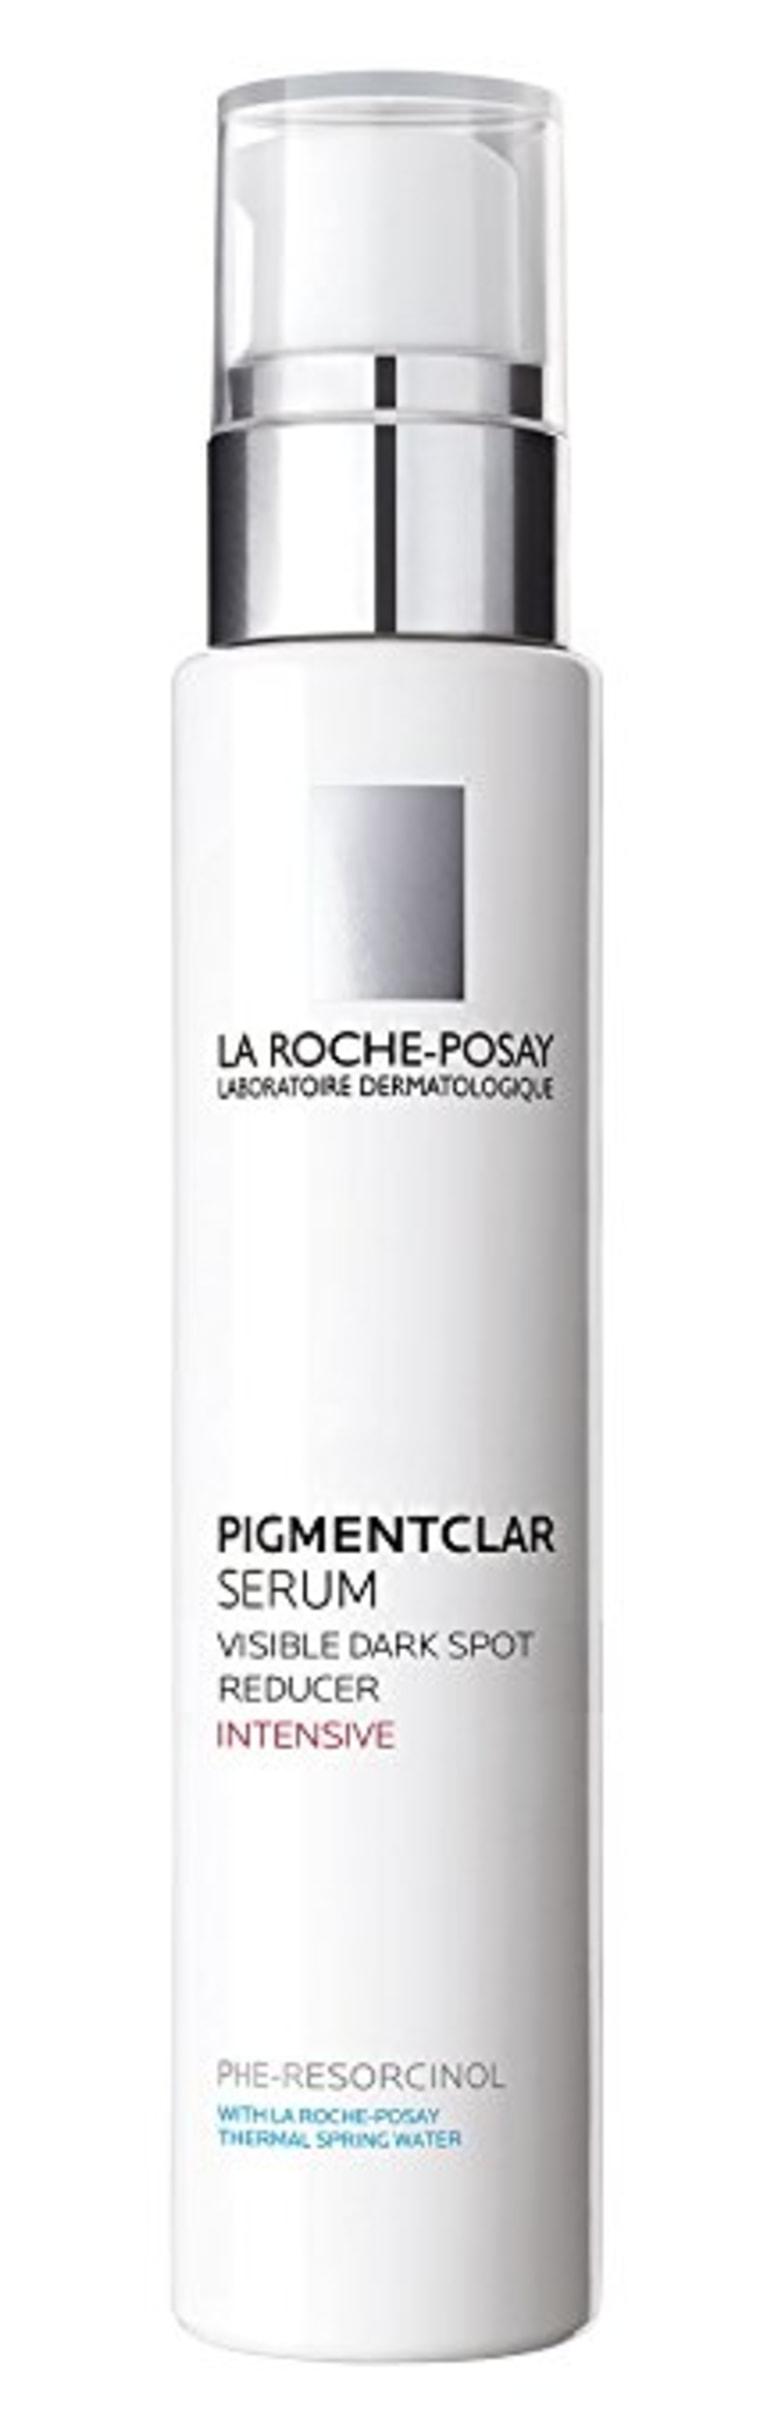 La Roche Posay Pigmentclar Dark Spot Serum